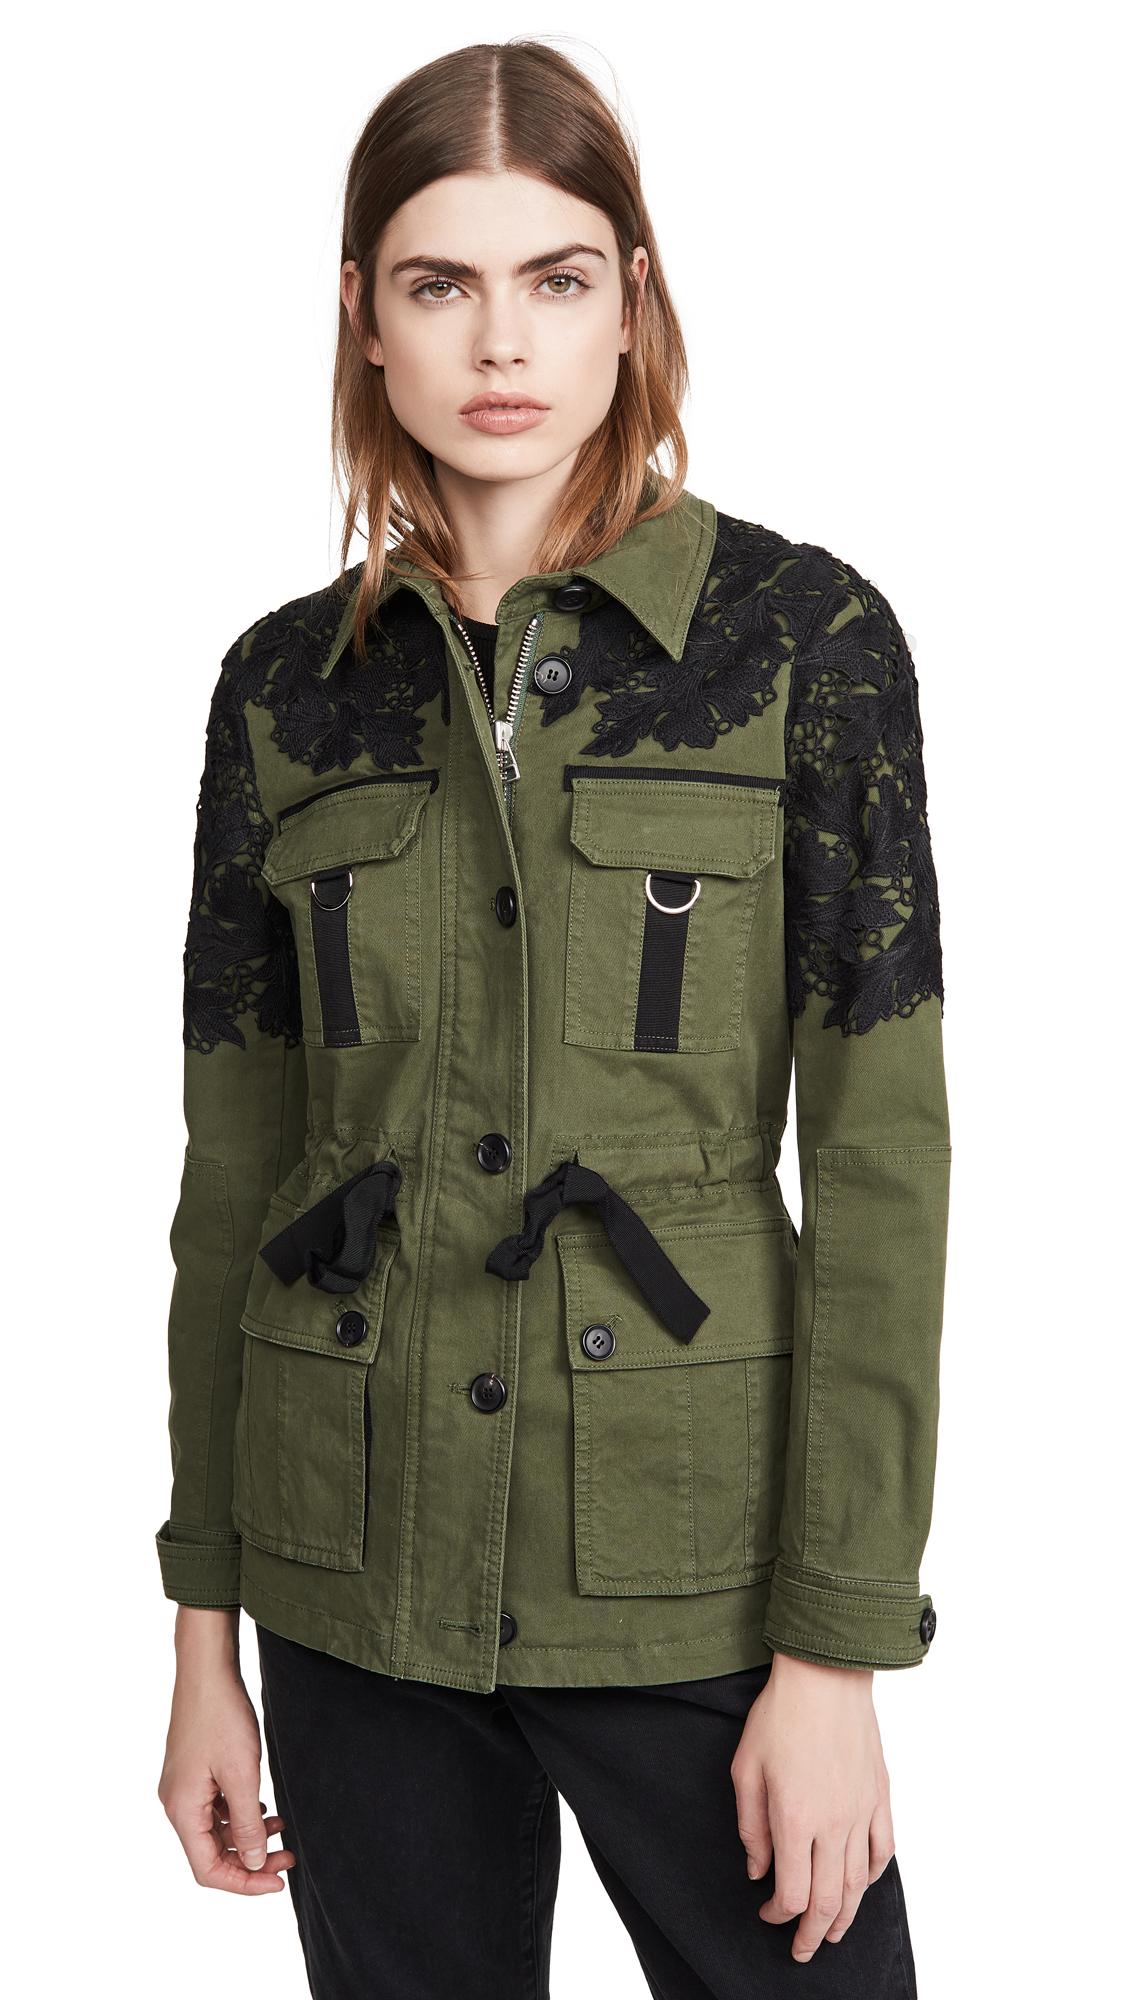 Buy Veronica Beard Heritage Jacket online beautiful Veronica Beard Jackets, Coats, Coats